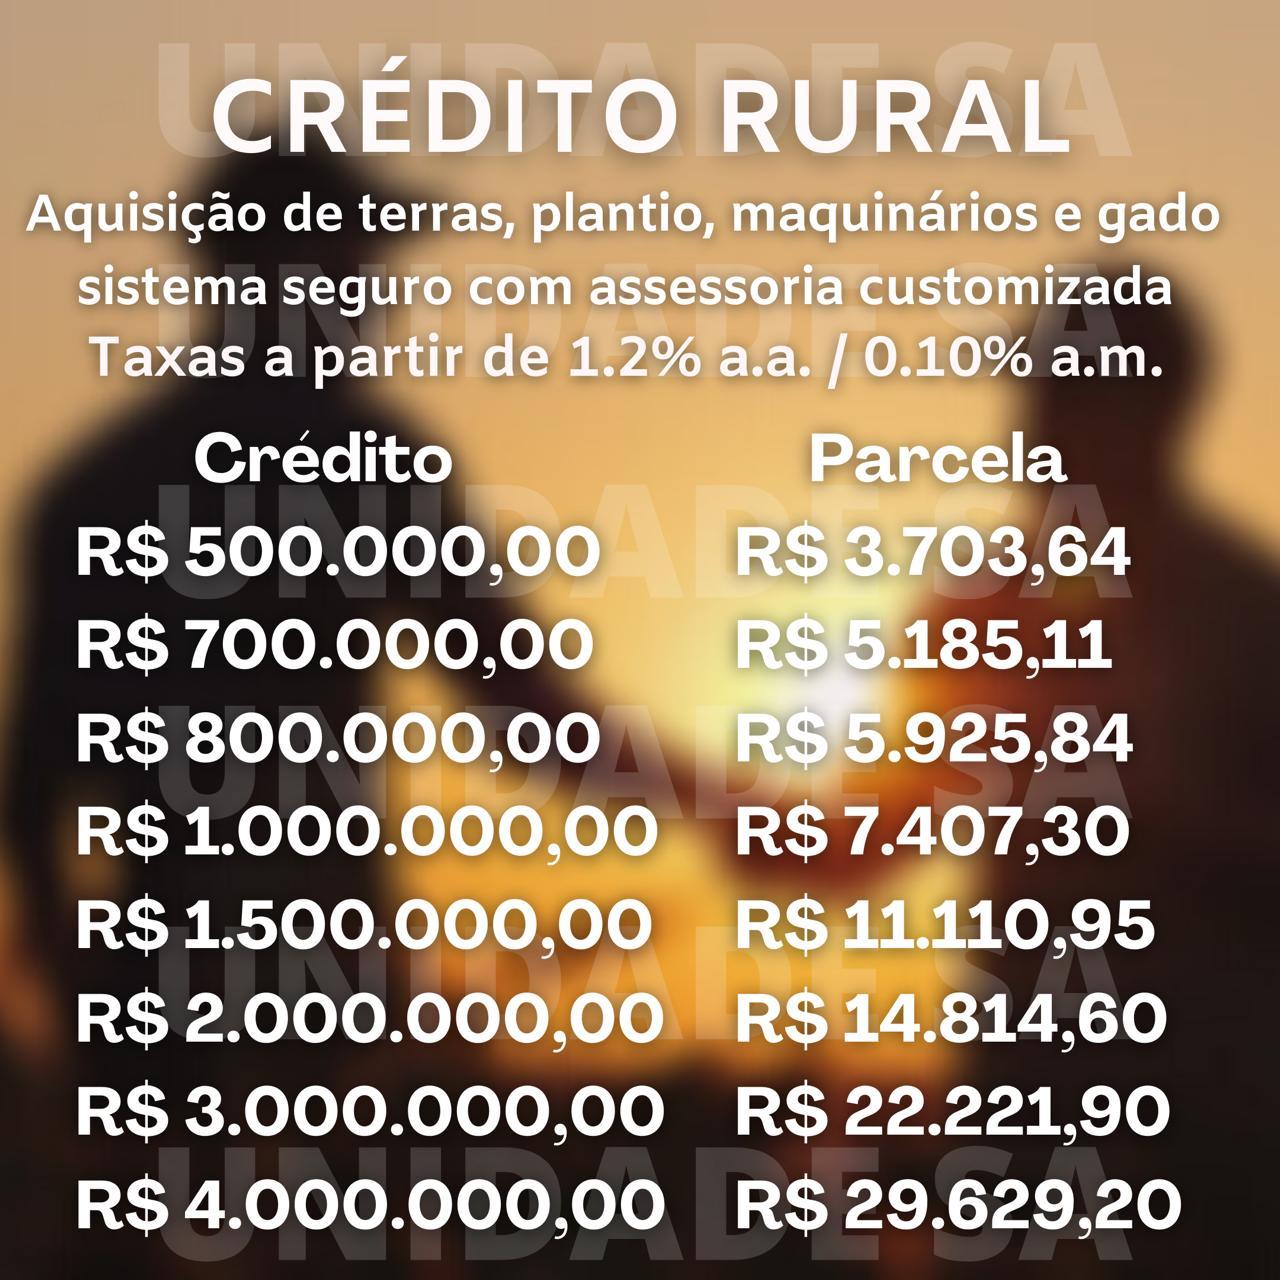 Venda de CRÉDITO RURAL SEM JUROS!